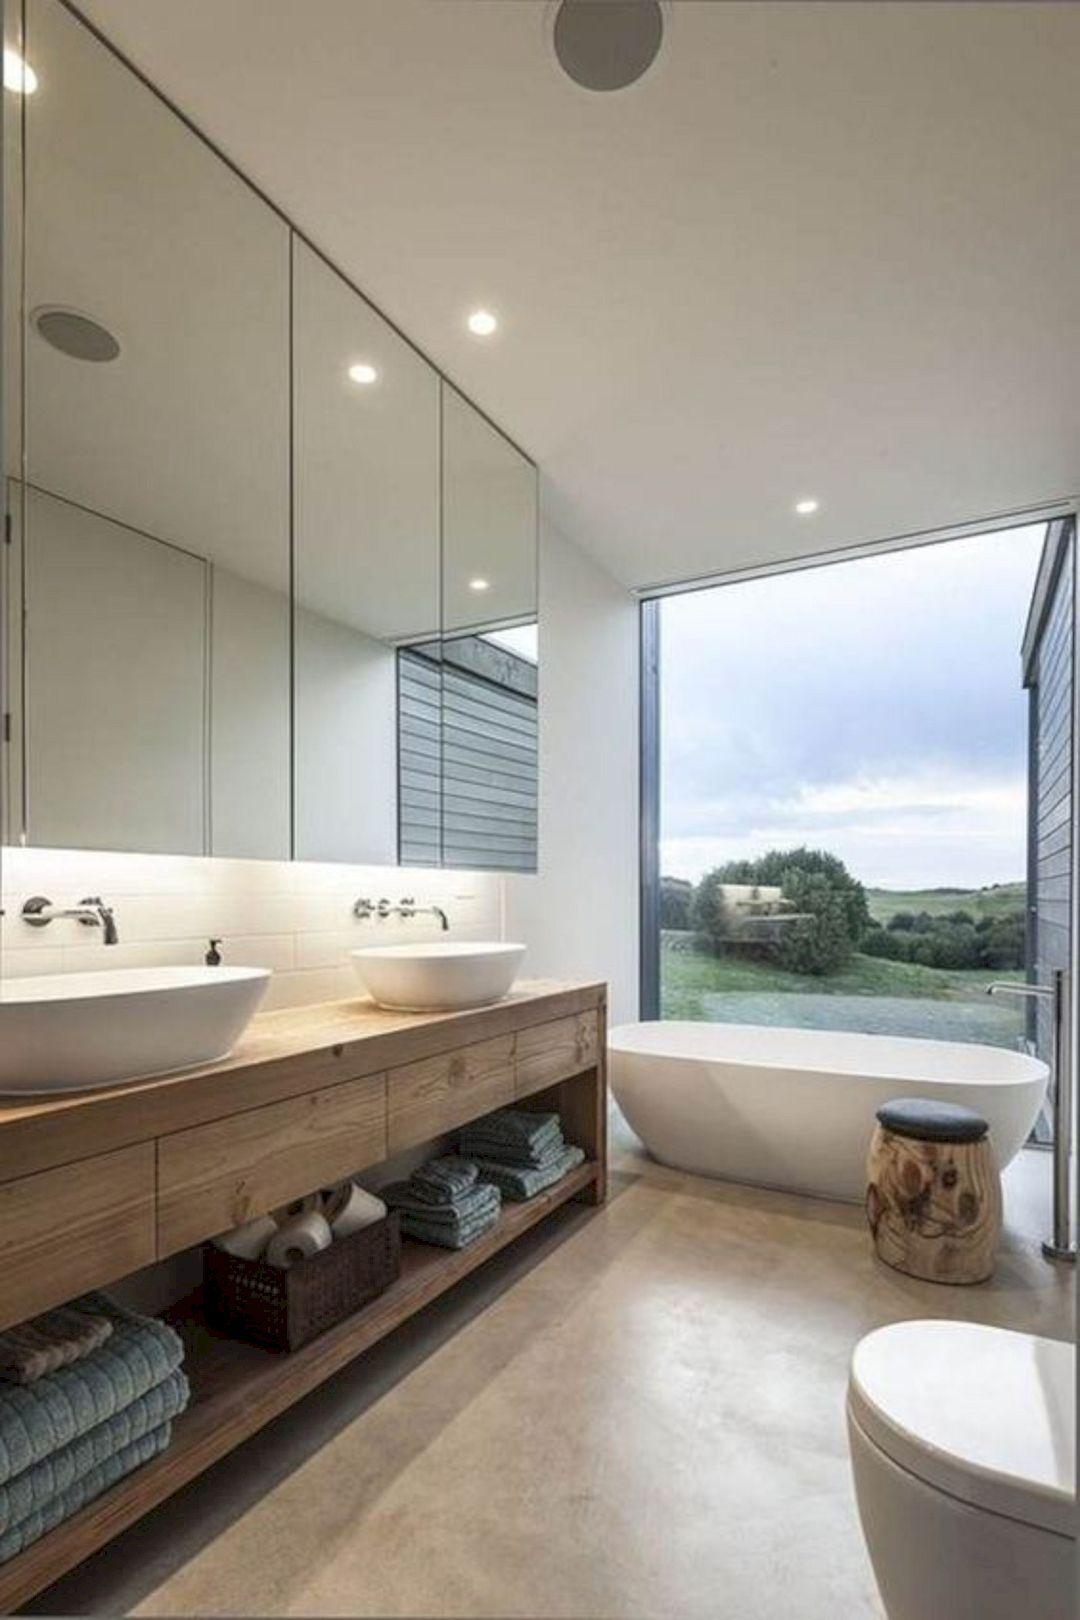 16 Small Bathroom Renovation Ideas Modern Bathroom Design Bathroom Design Modern Bathroom